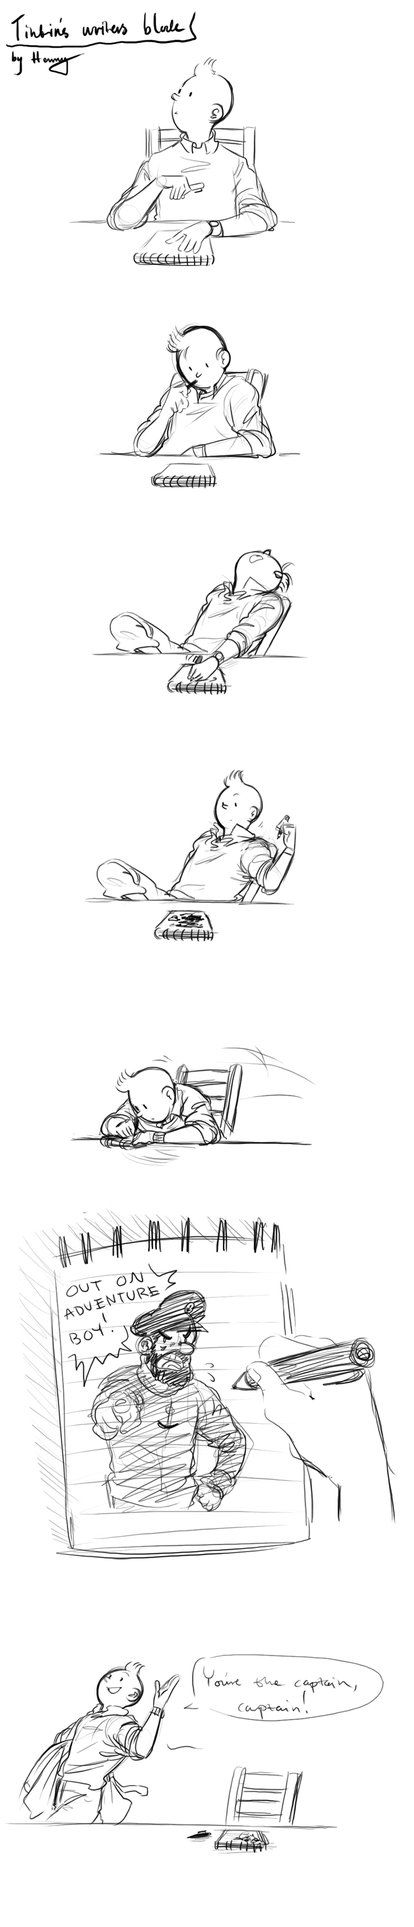 How I feel when I do homework! Right on Tintin!